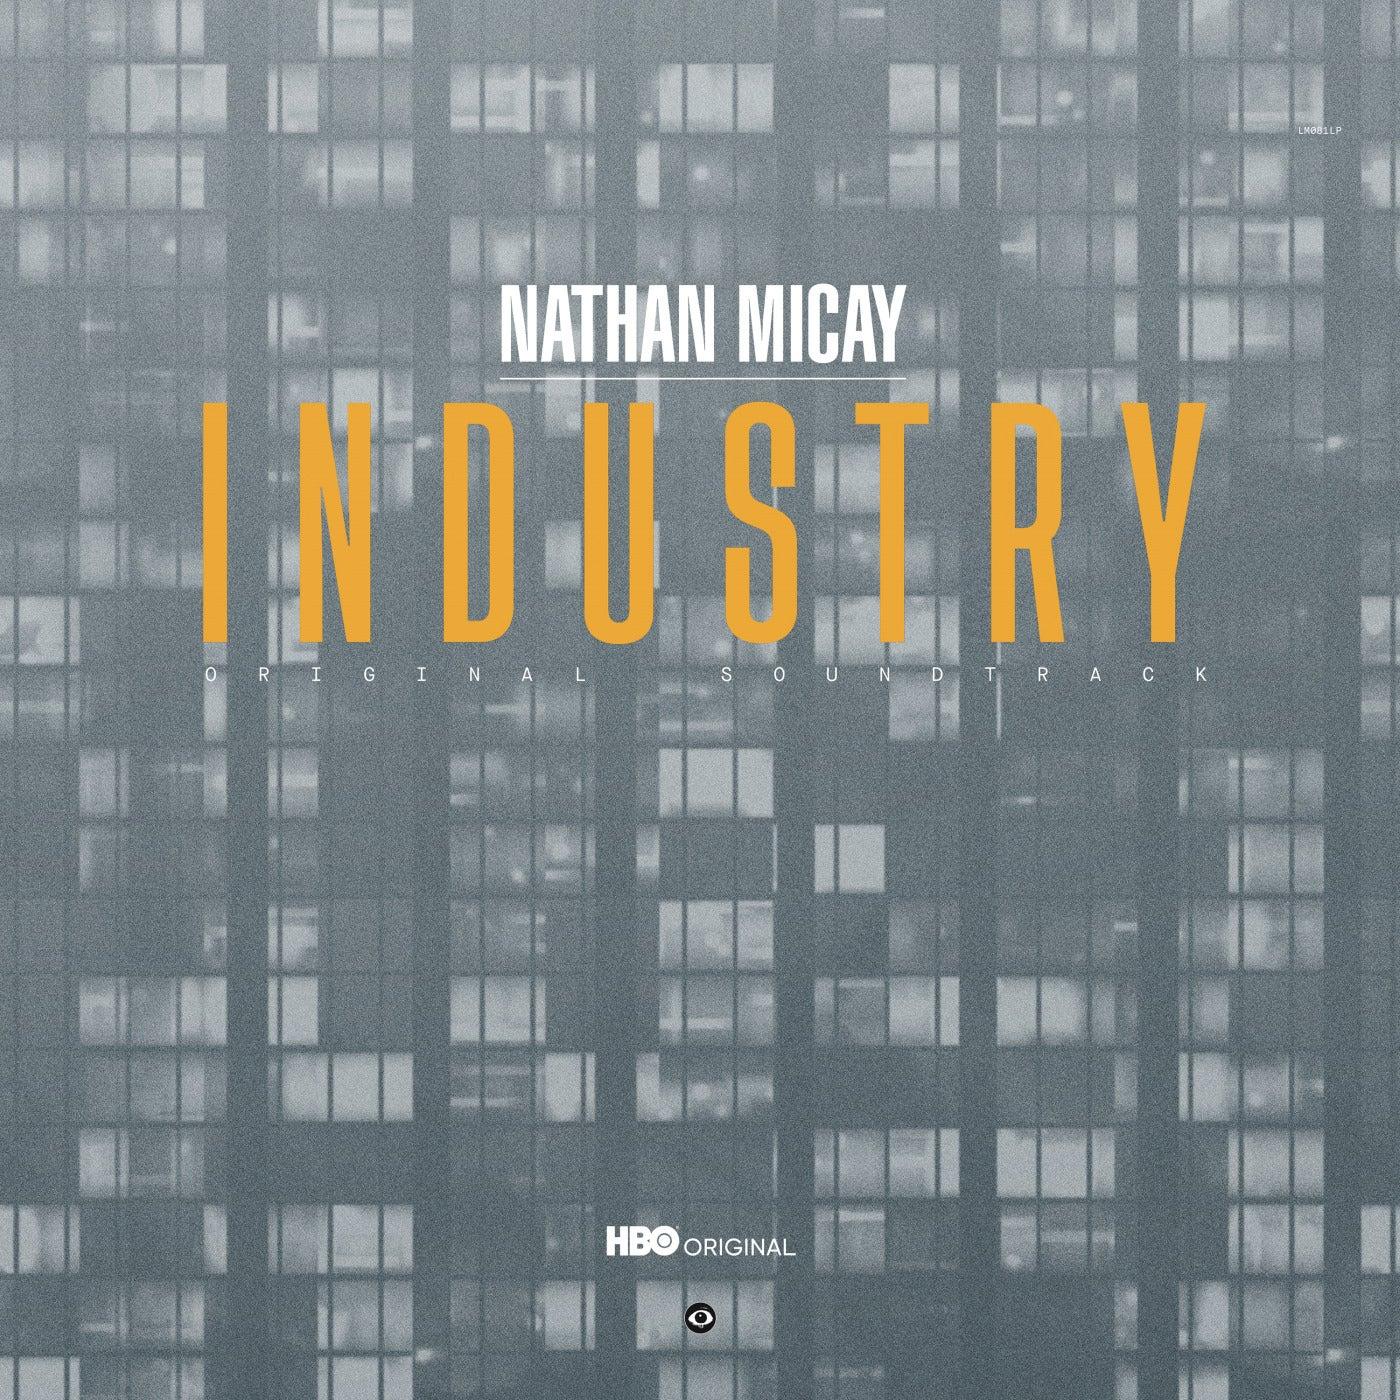 Industry (Green Light/Fun Night Breaks Mix) (Original Mix)